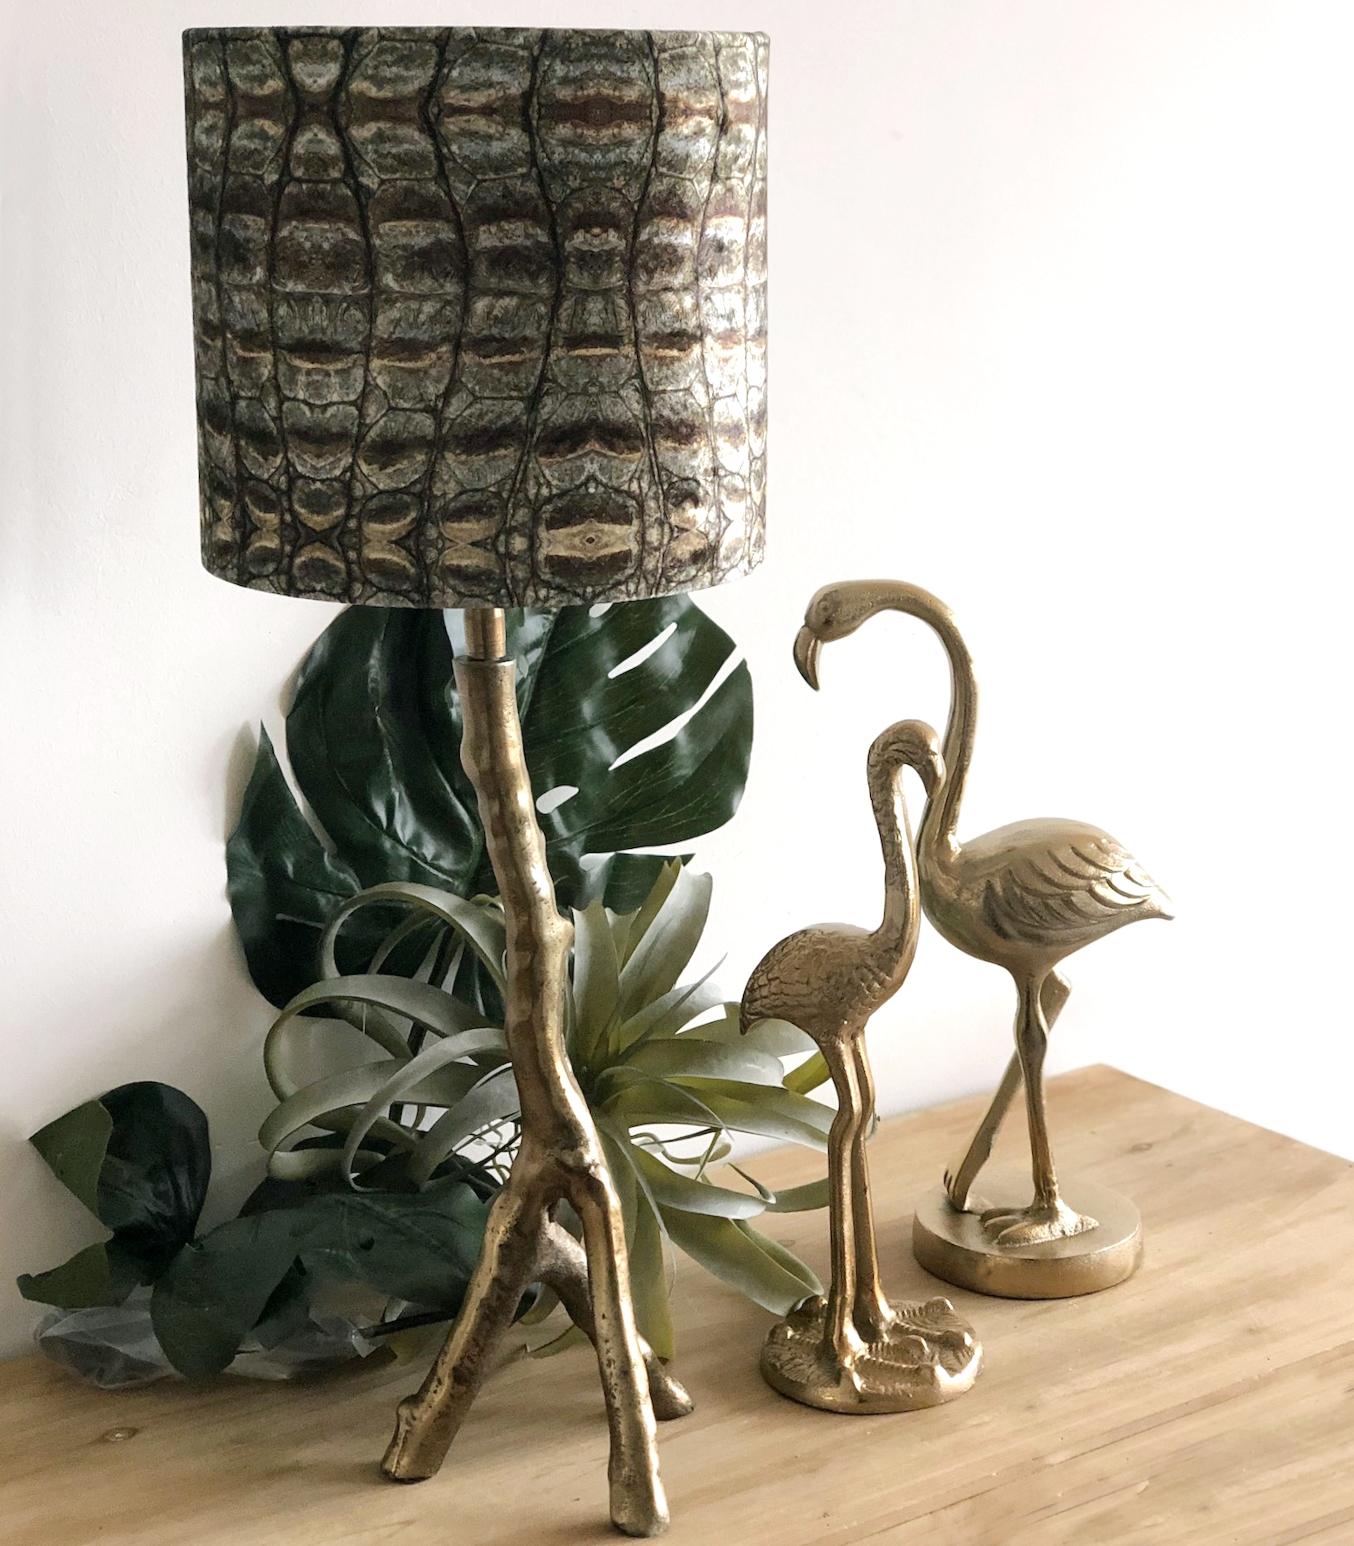 tischlampe bronze ast zweig motiv lampenschirm gr n gold. Black Bedroom Furniture Sets. Home Design Ideas